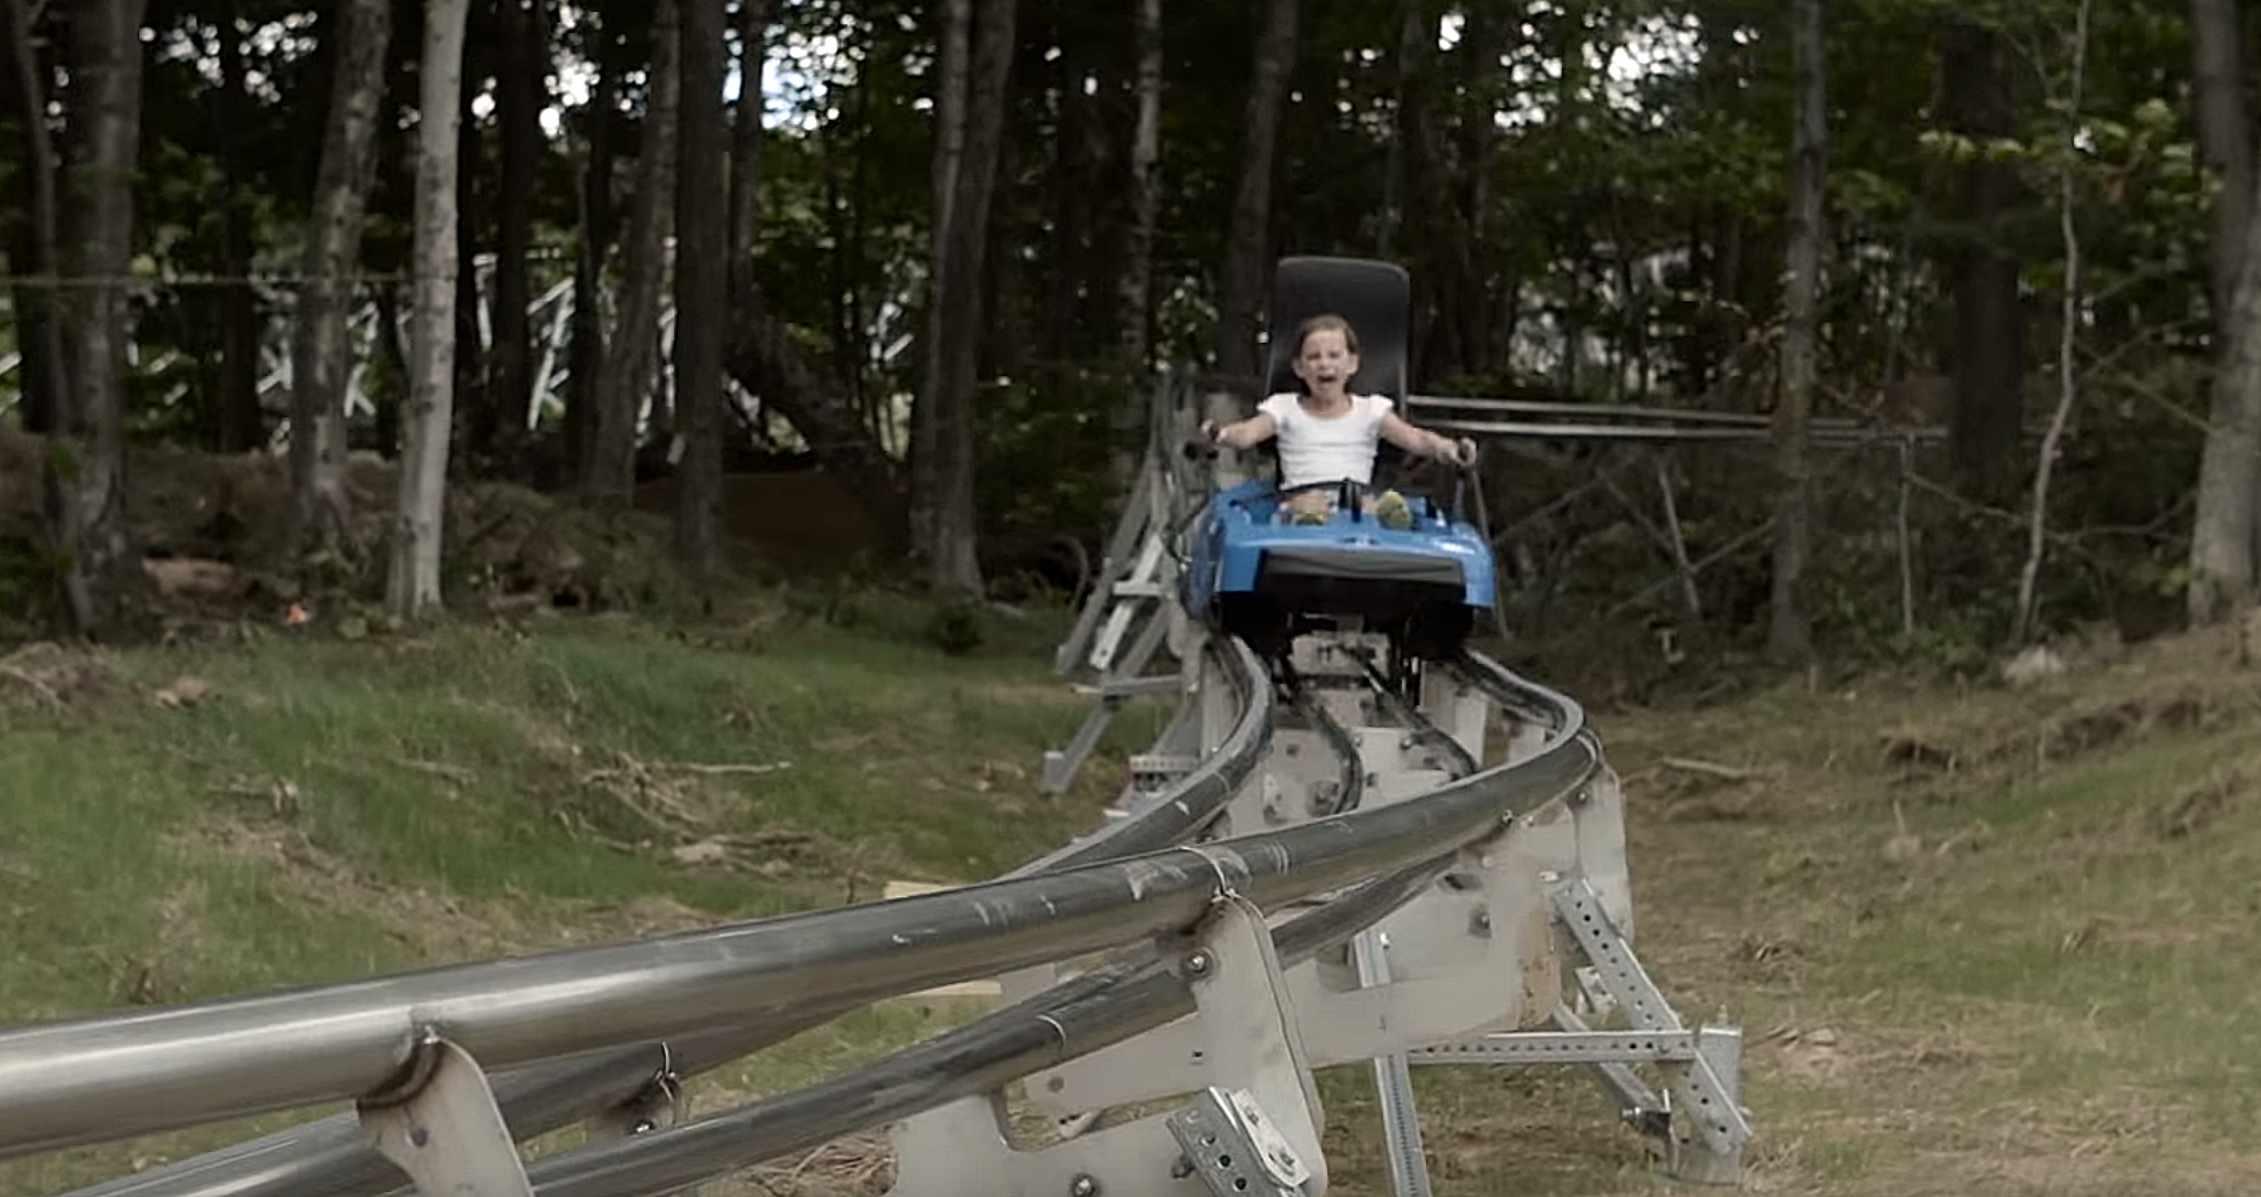 Killington's Beast Mountain Coaster